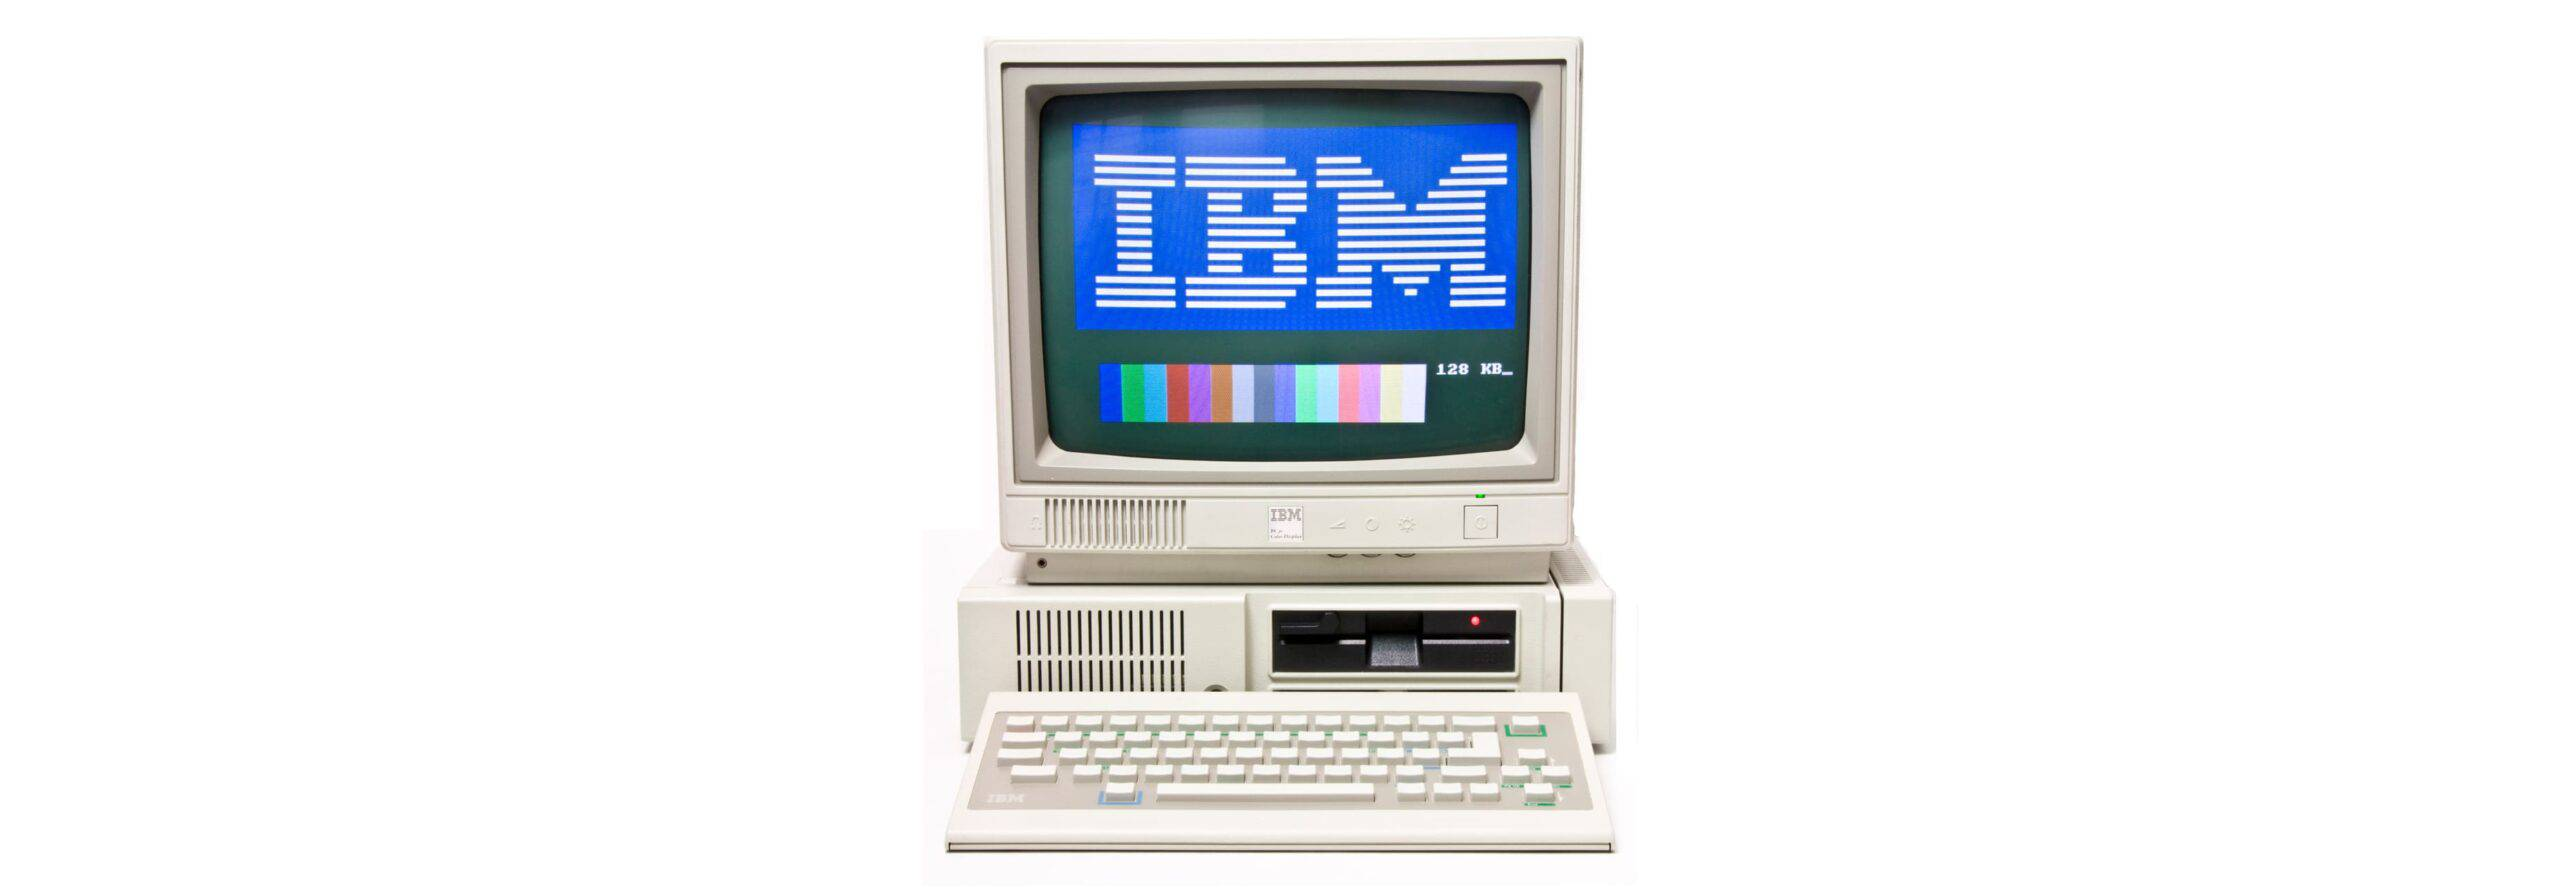 IBM's PCJr computer